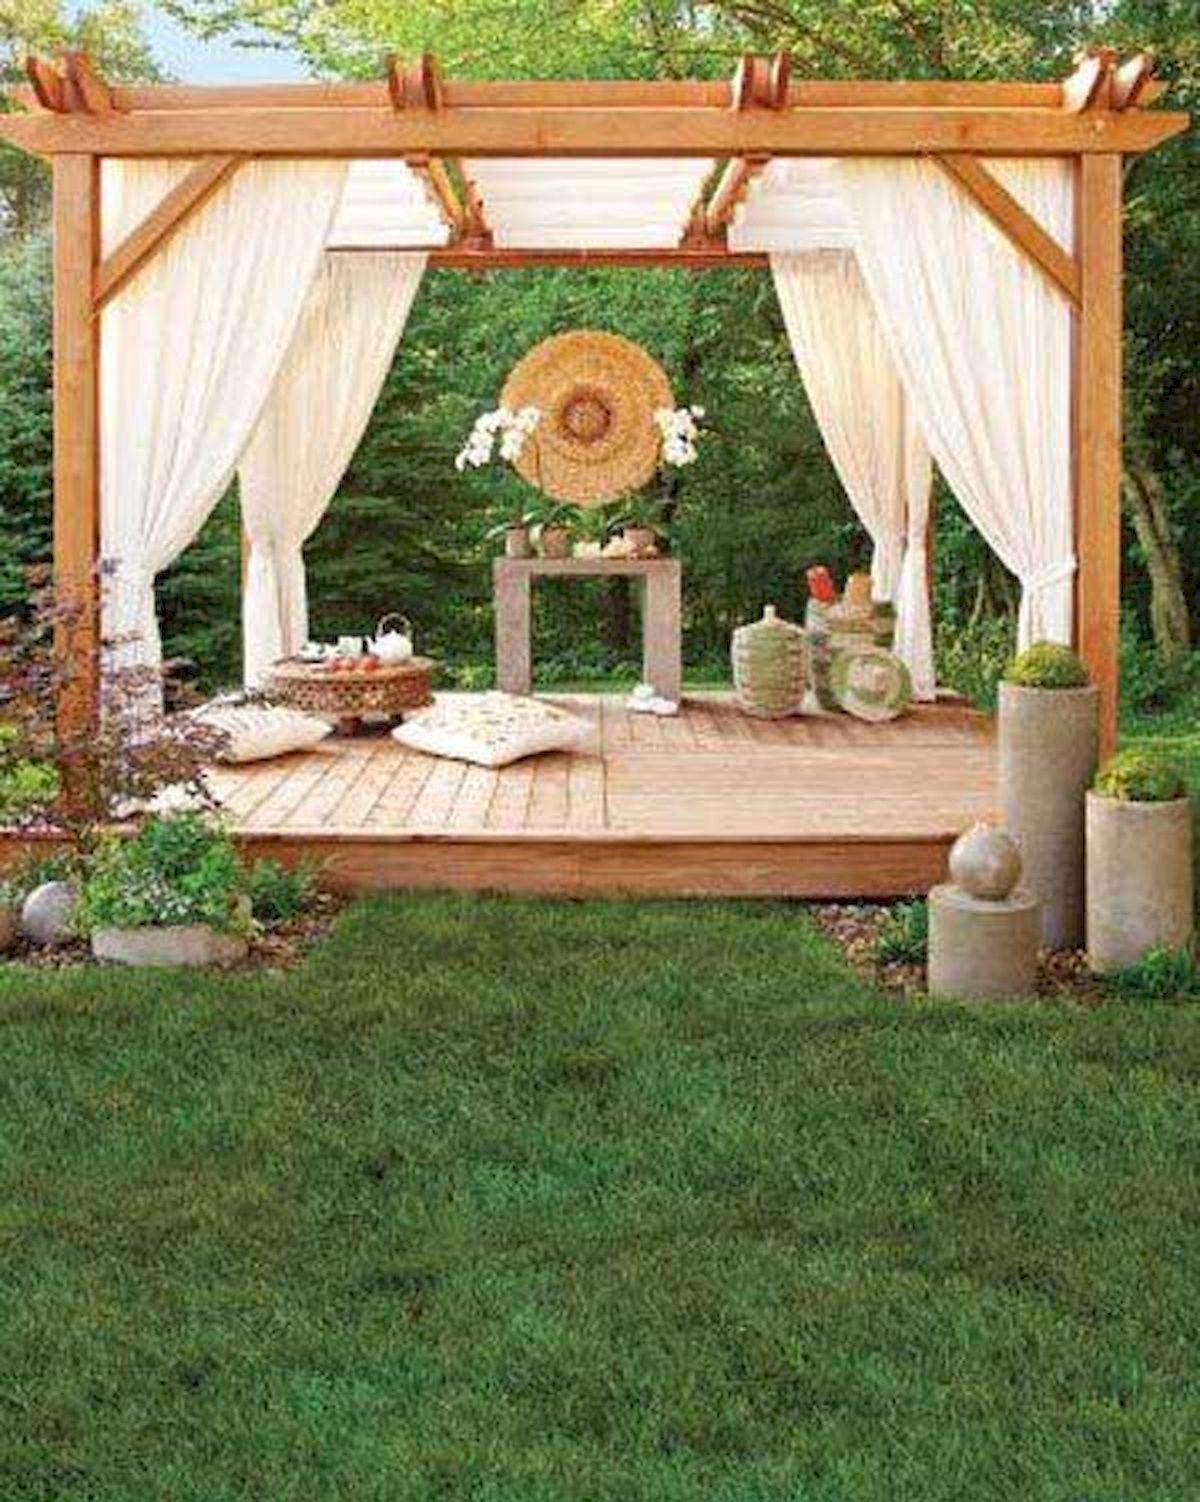 55 Stunning DIY Pergola Design Ideas And Remodel For Your Summer -  Abantiades Decor - 55 Stunning DIY Pergola Design Ideas And Remodel For Your Summer